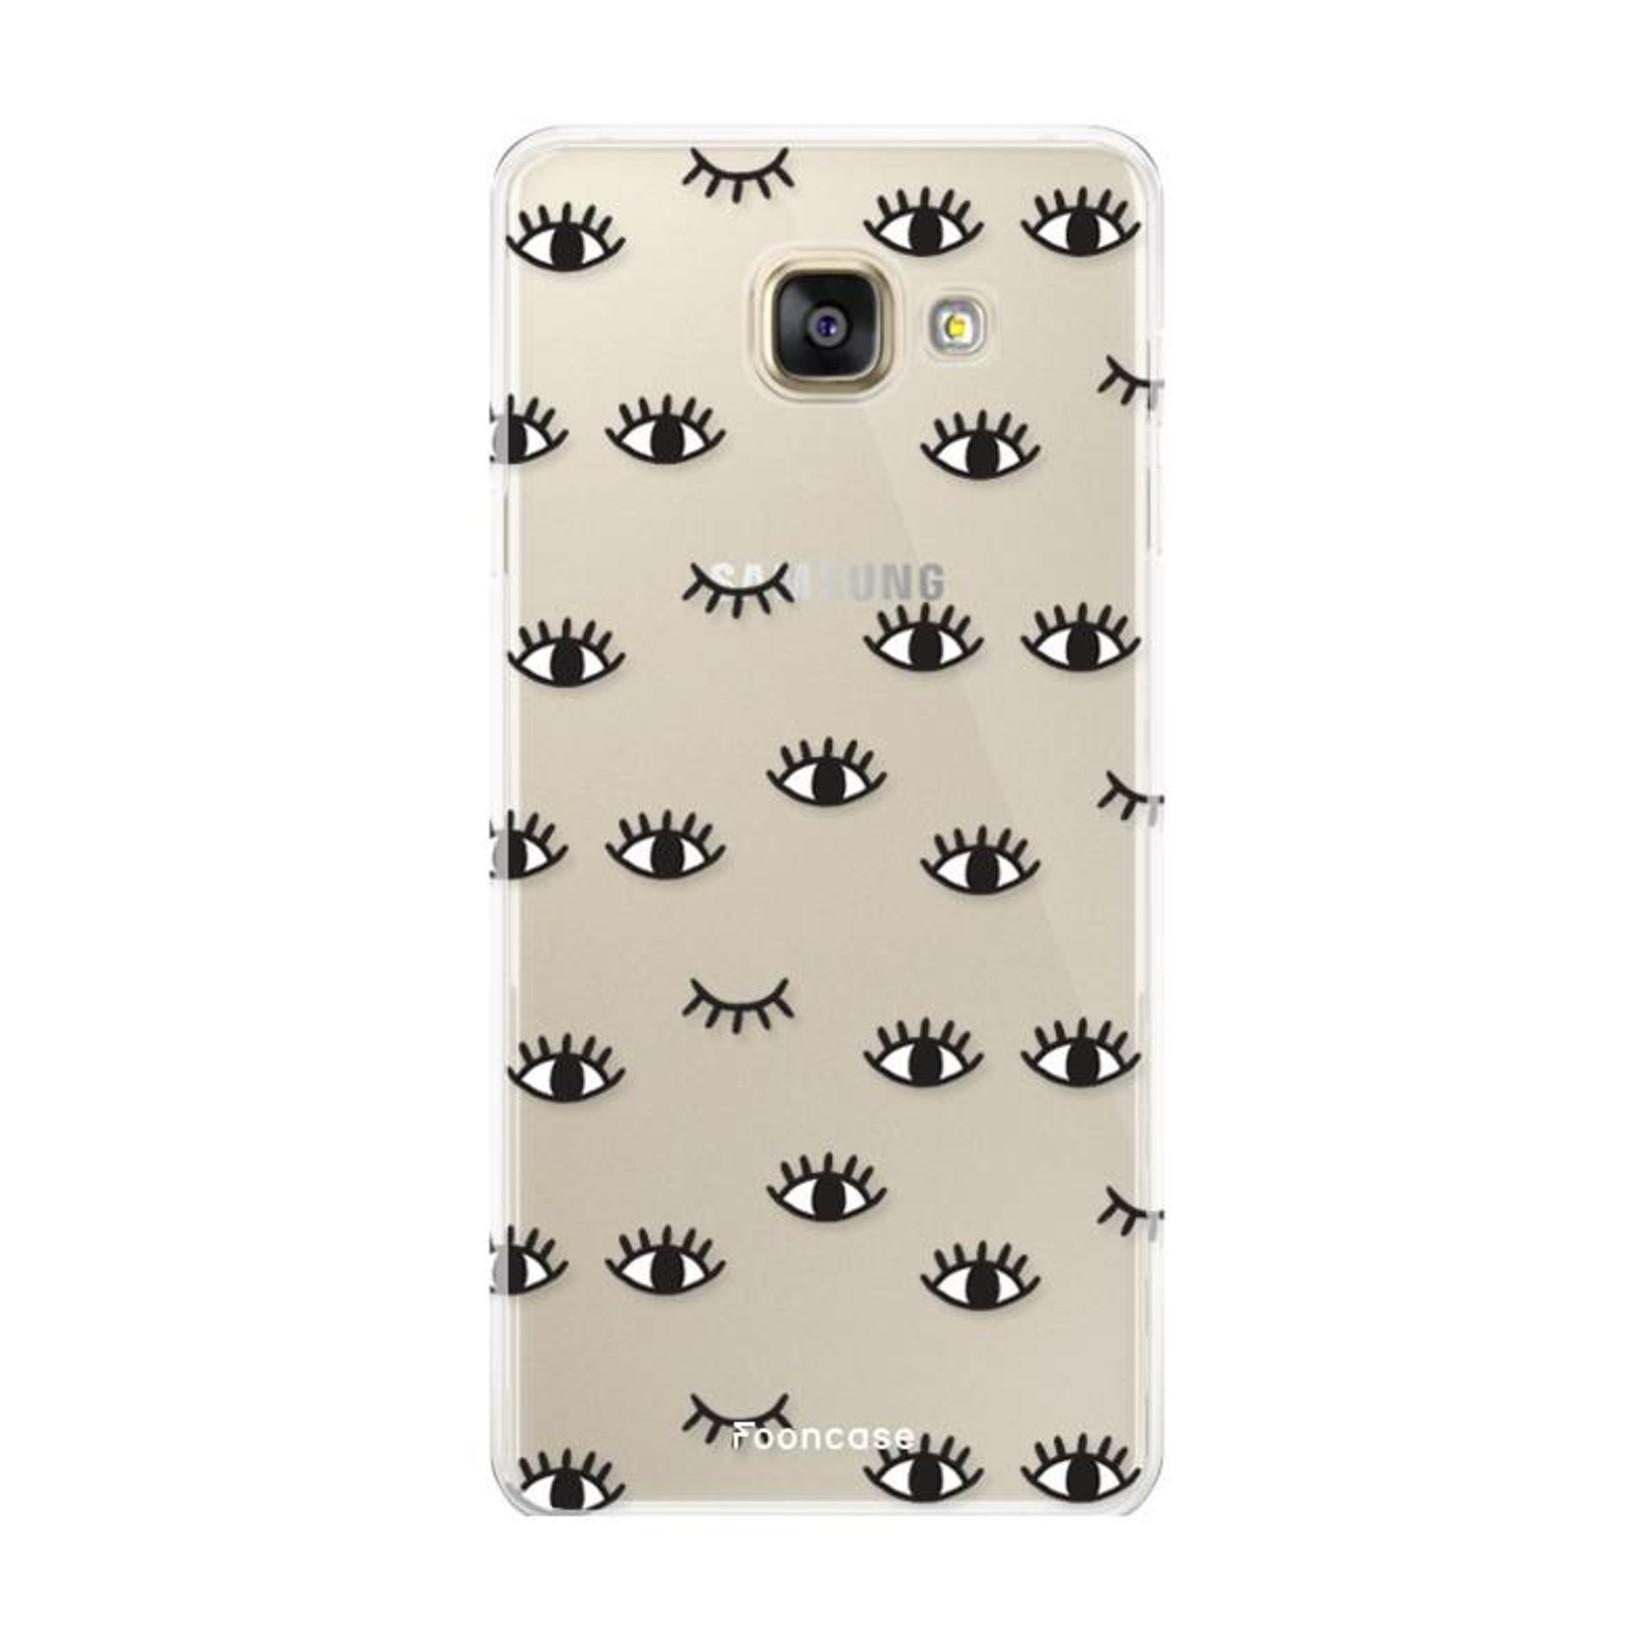 FOONCASE Samsung Galaxy A3 2016 hoesje TPU Soft Case - Back Cover - Eyes / Ogen